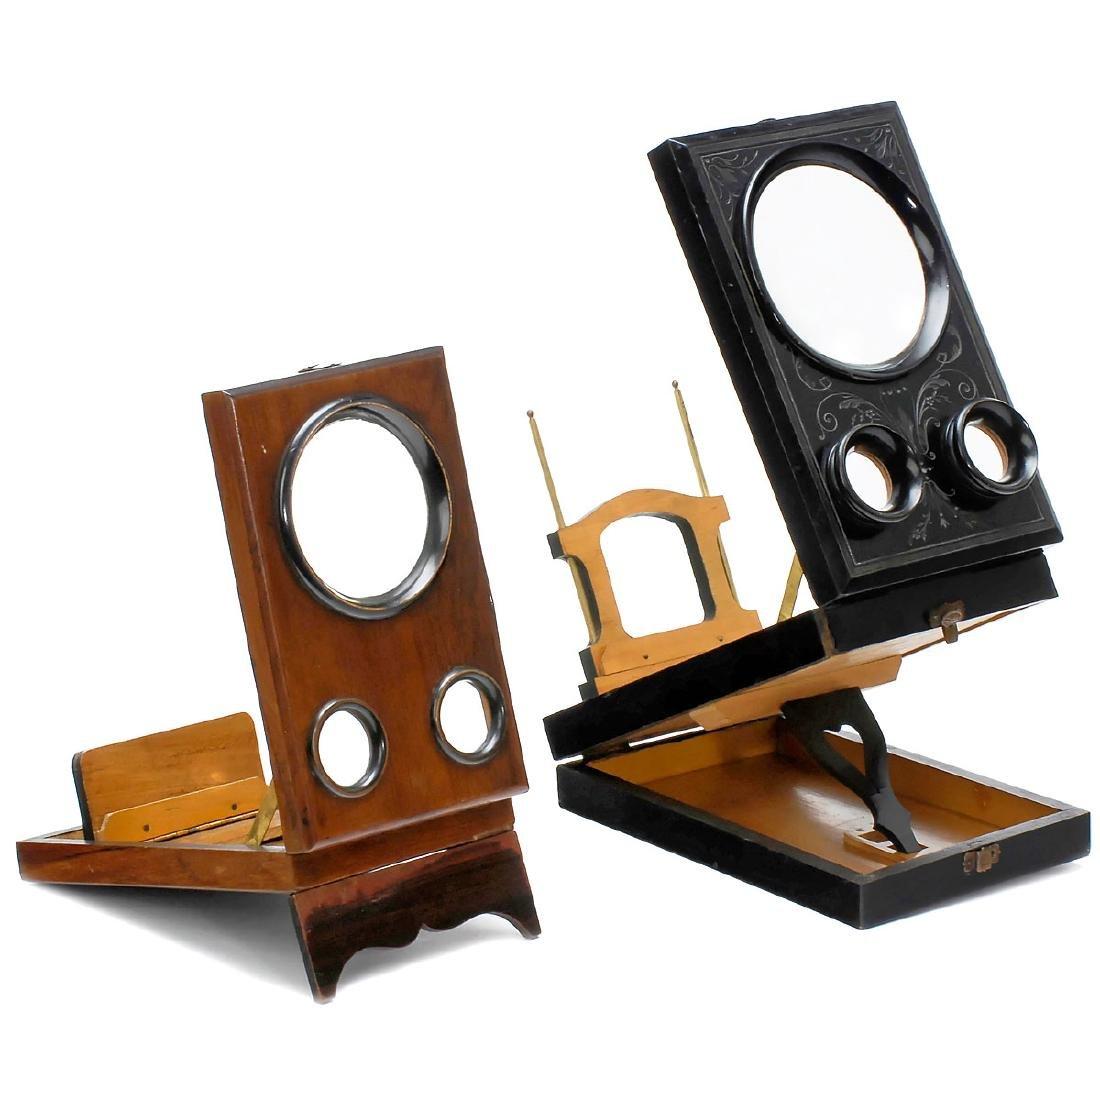 2 Small Stereo Graphoscopes